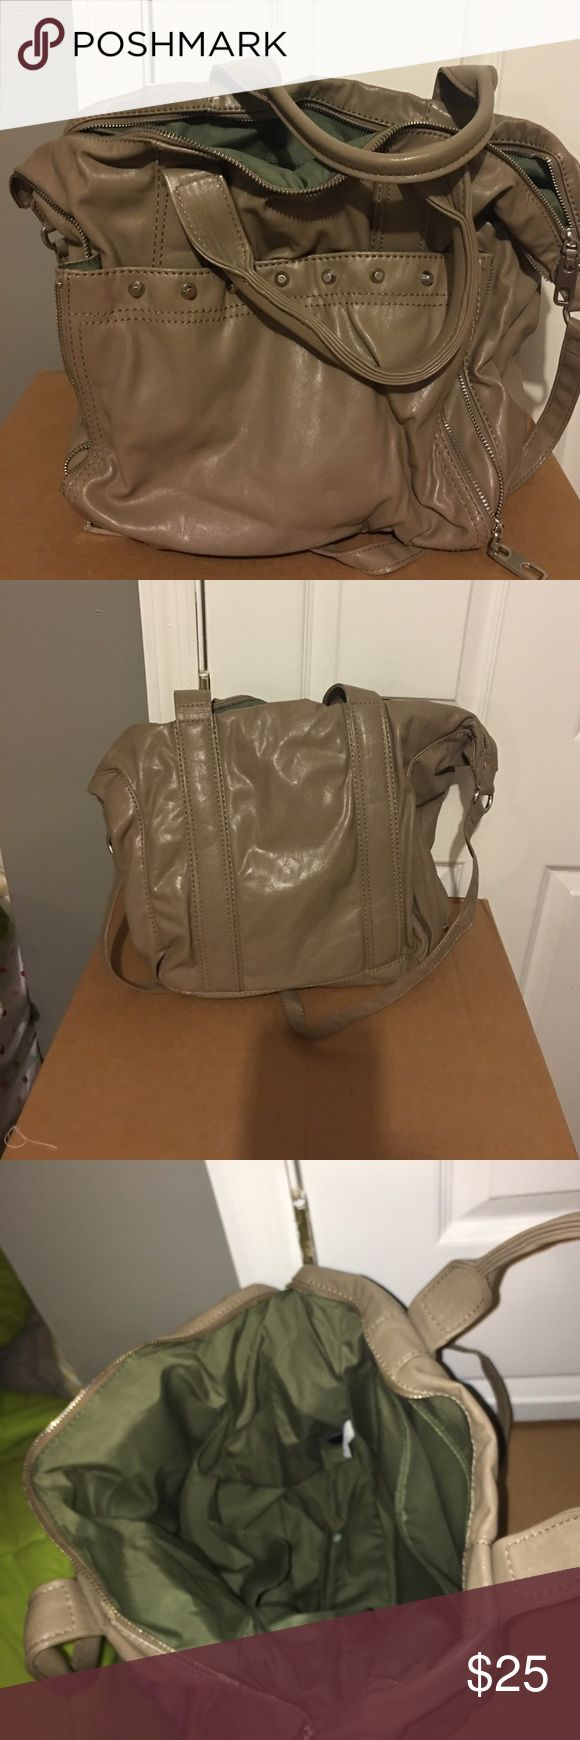 Gap bag Green inside light brown outside. No damage. Great for carrying books. GAP Bags Shoulder Bags